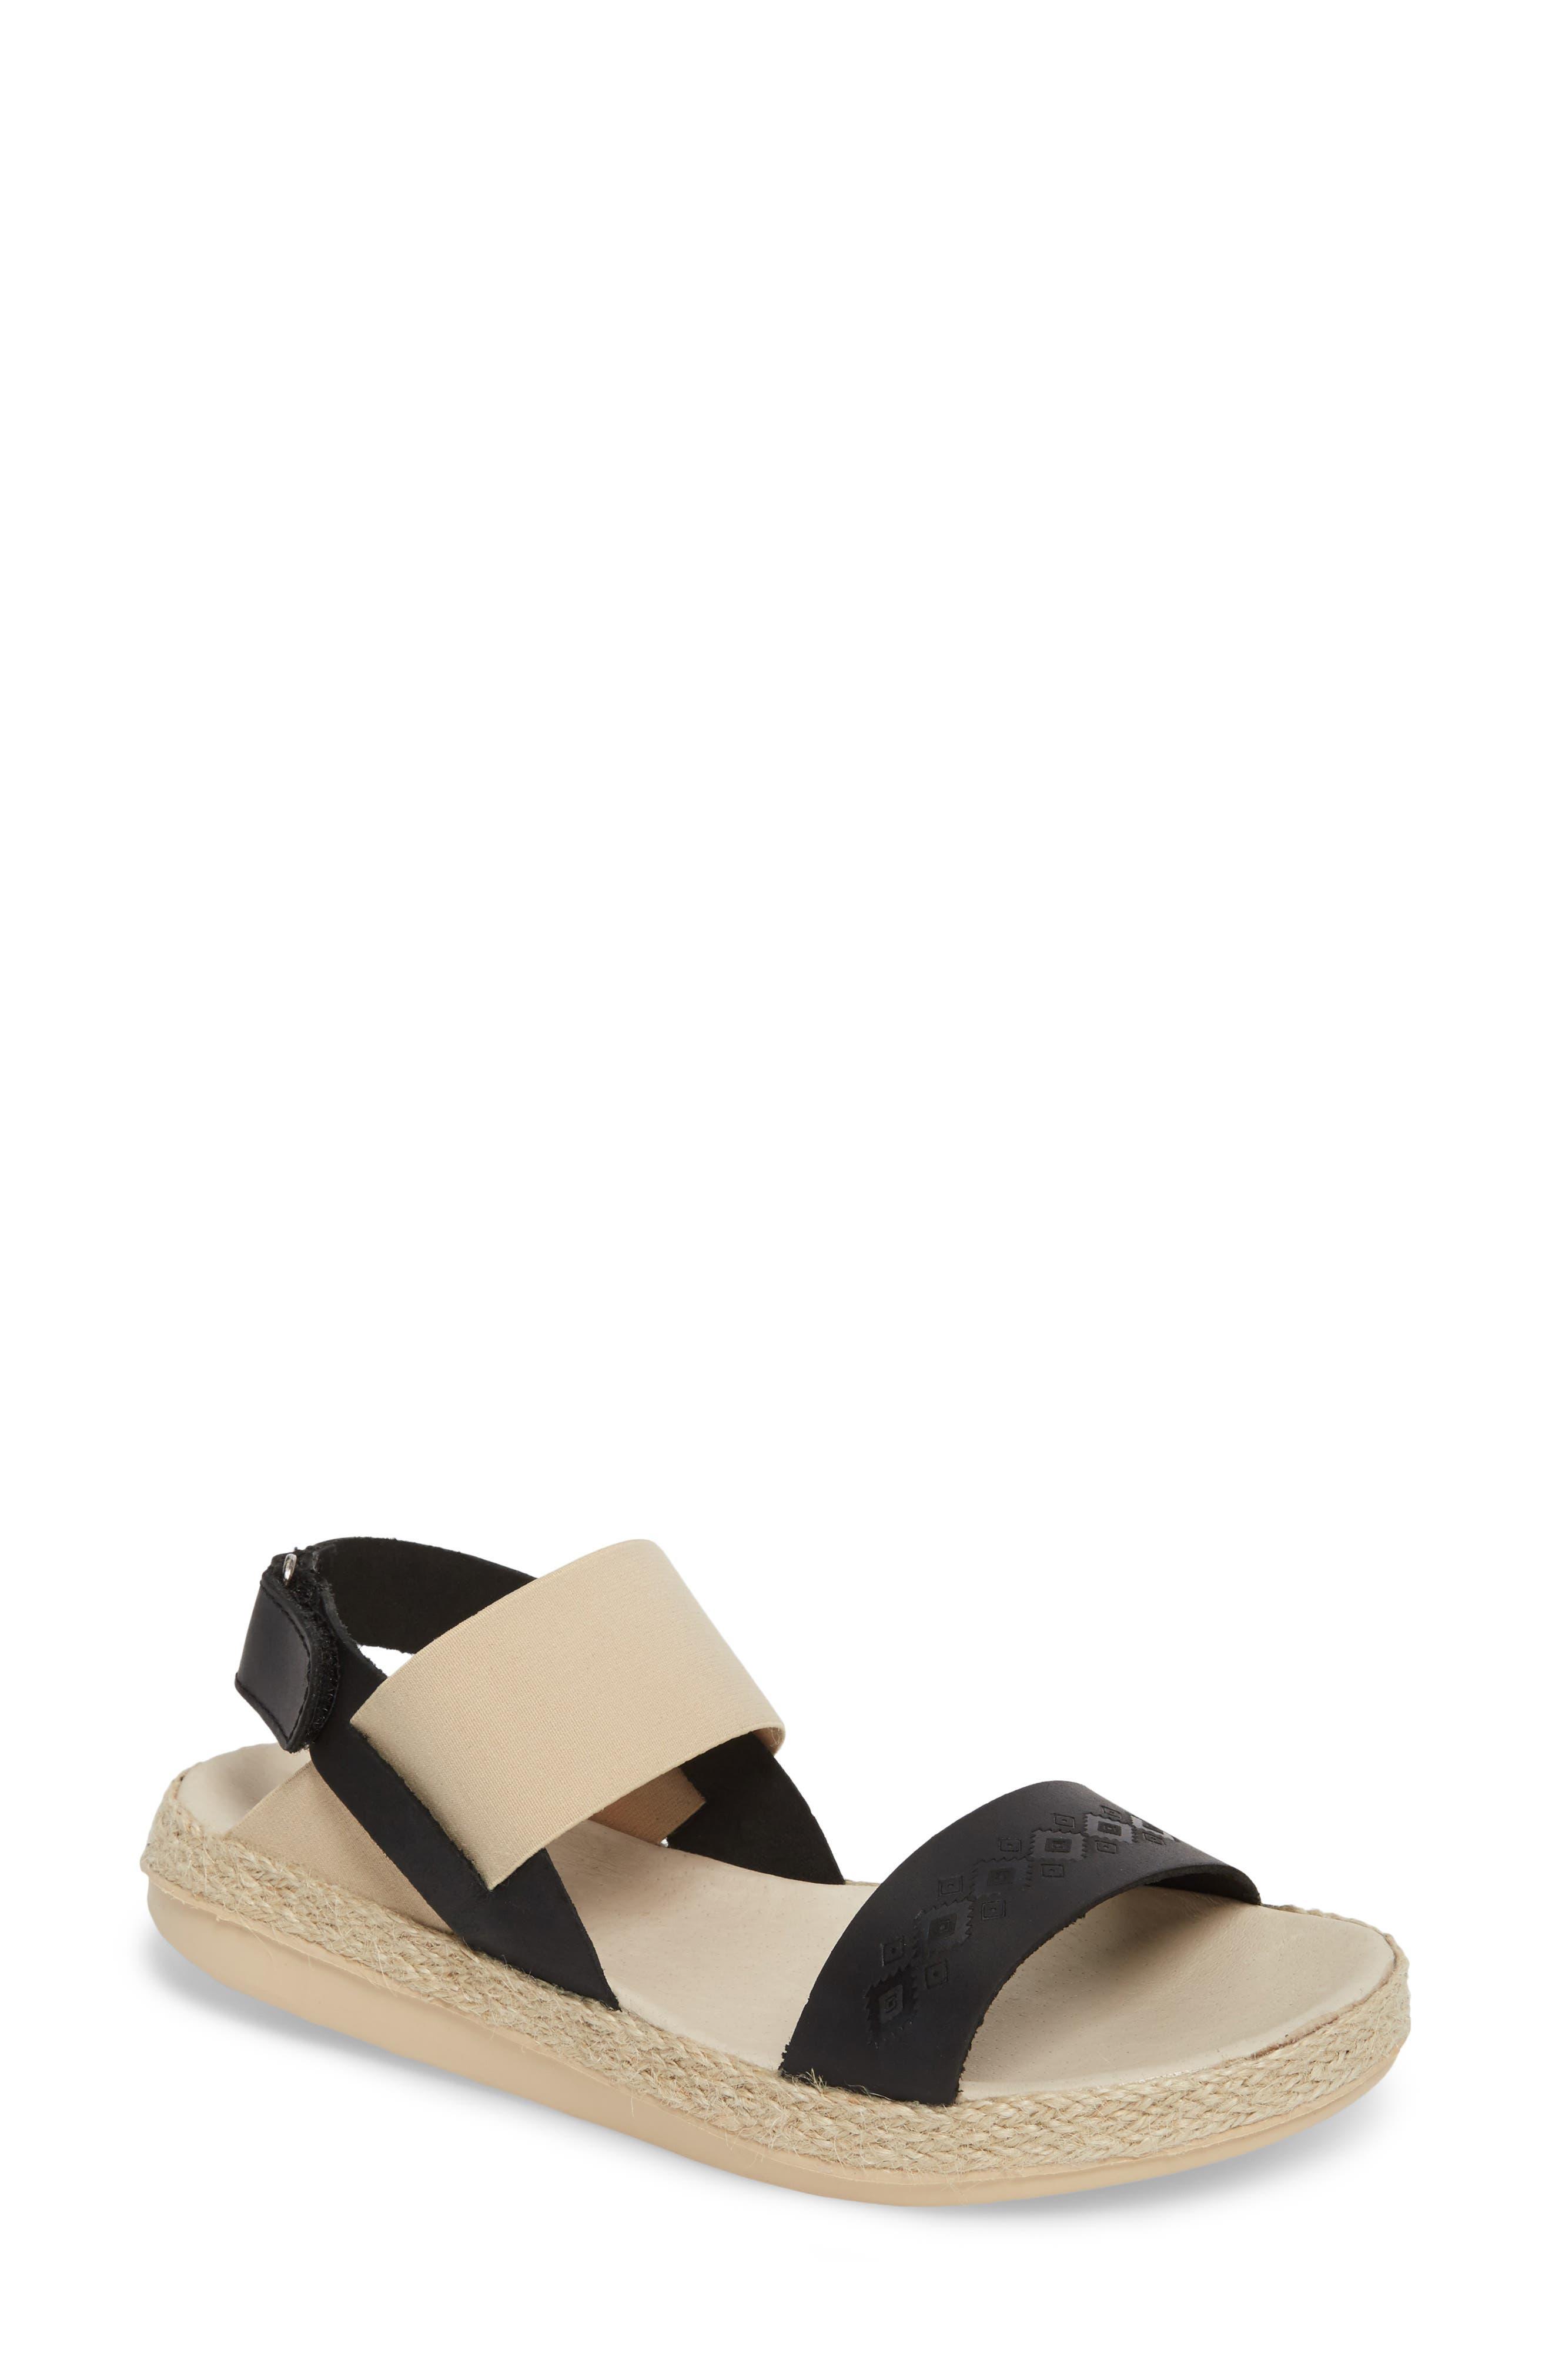 Tobermory Sandal,                         Main,                         color, Black Leather